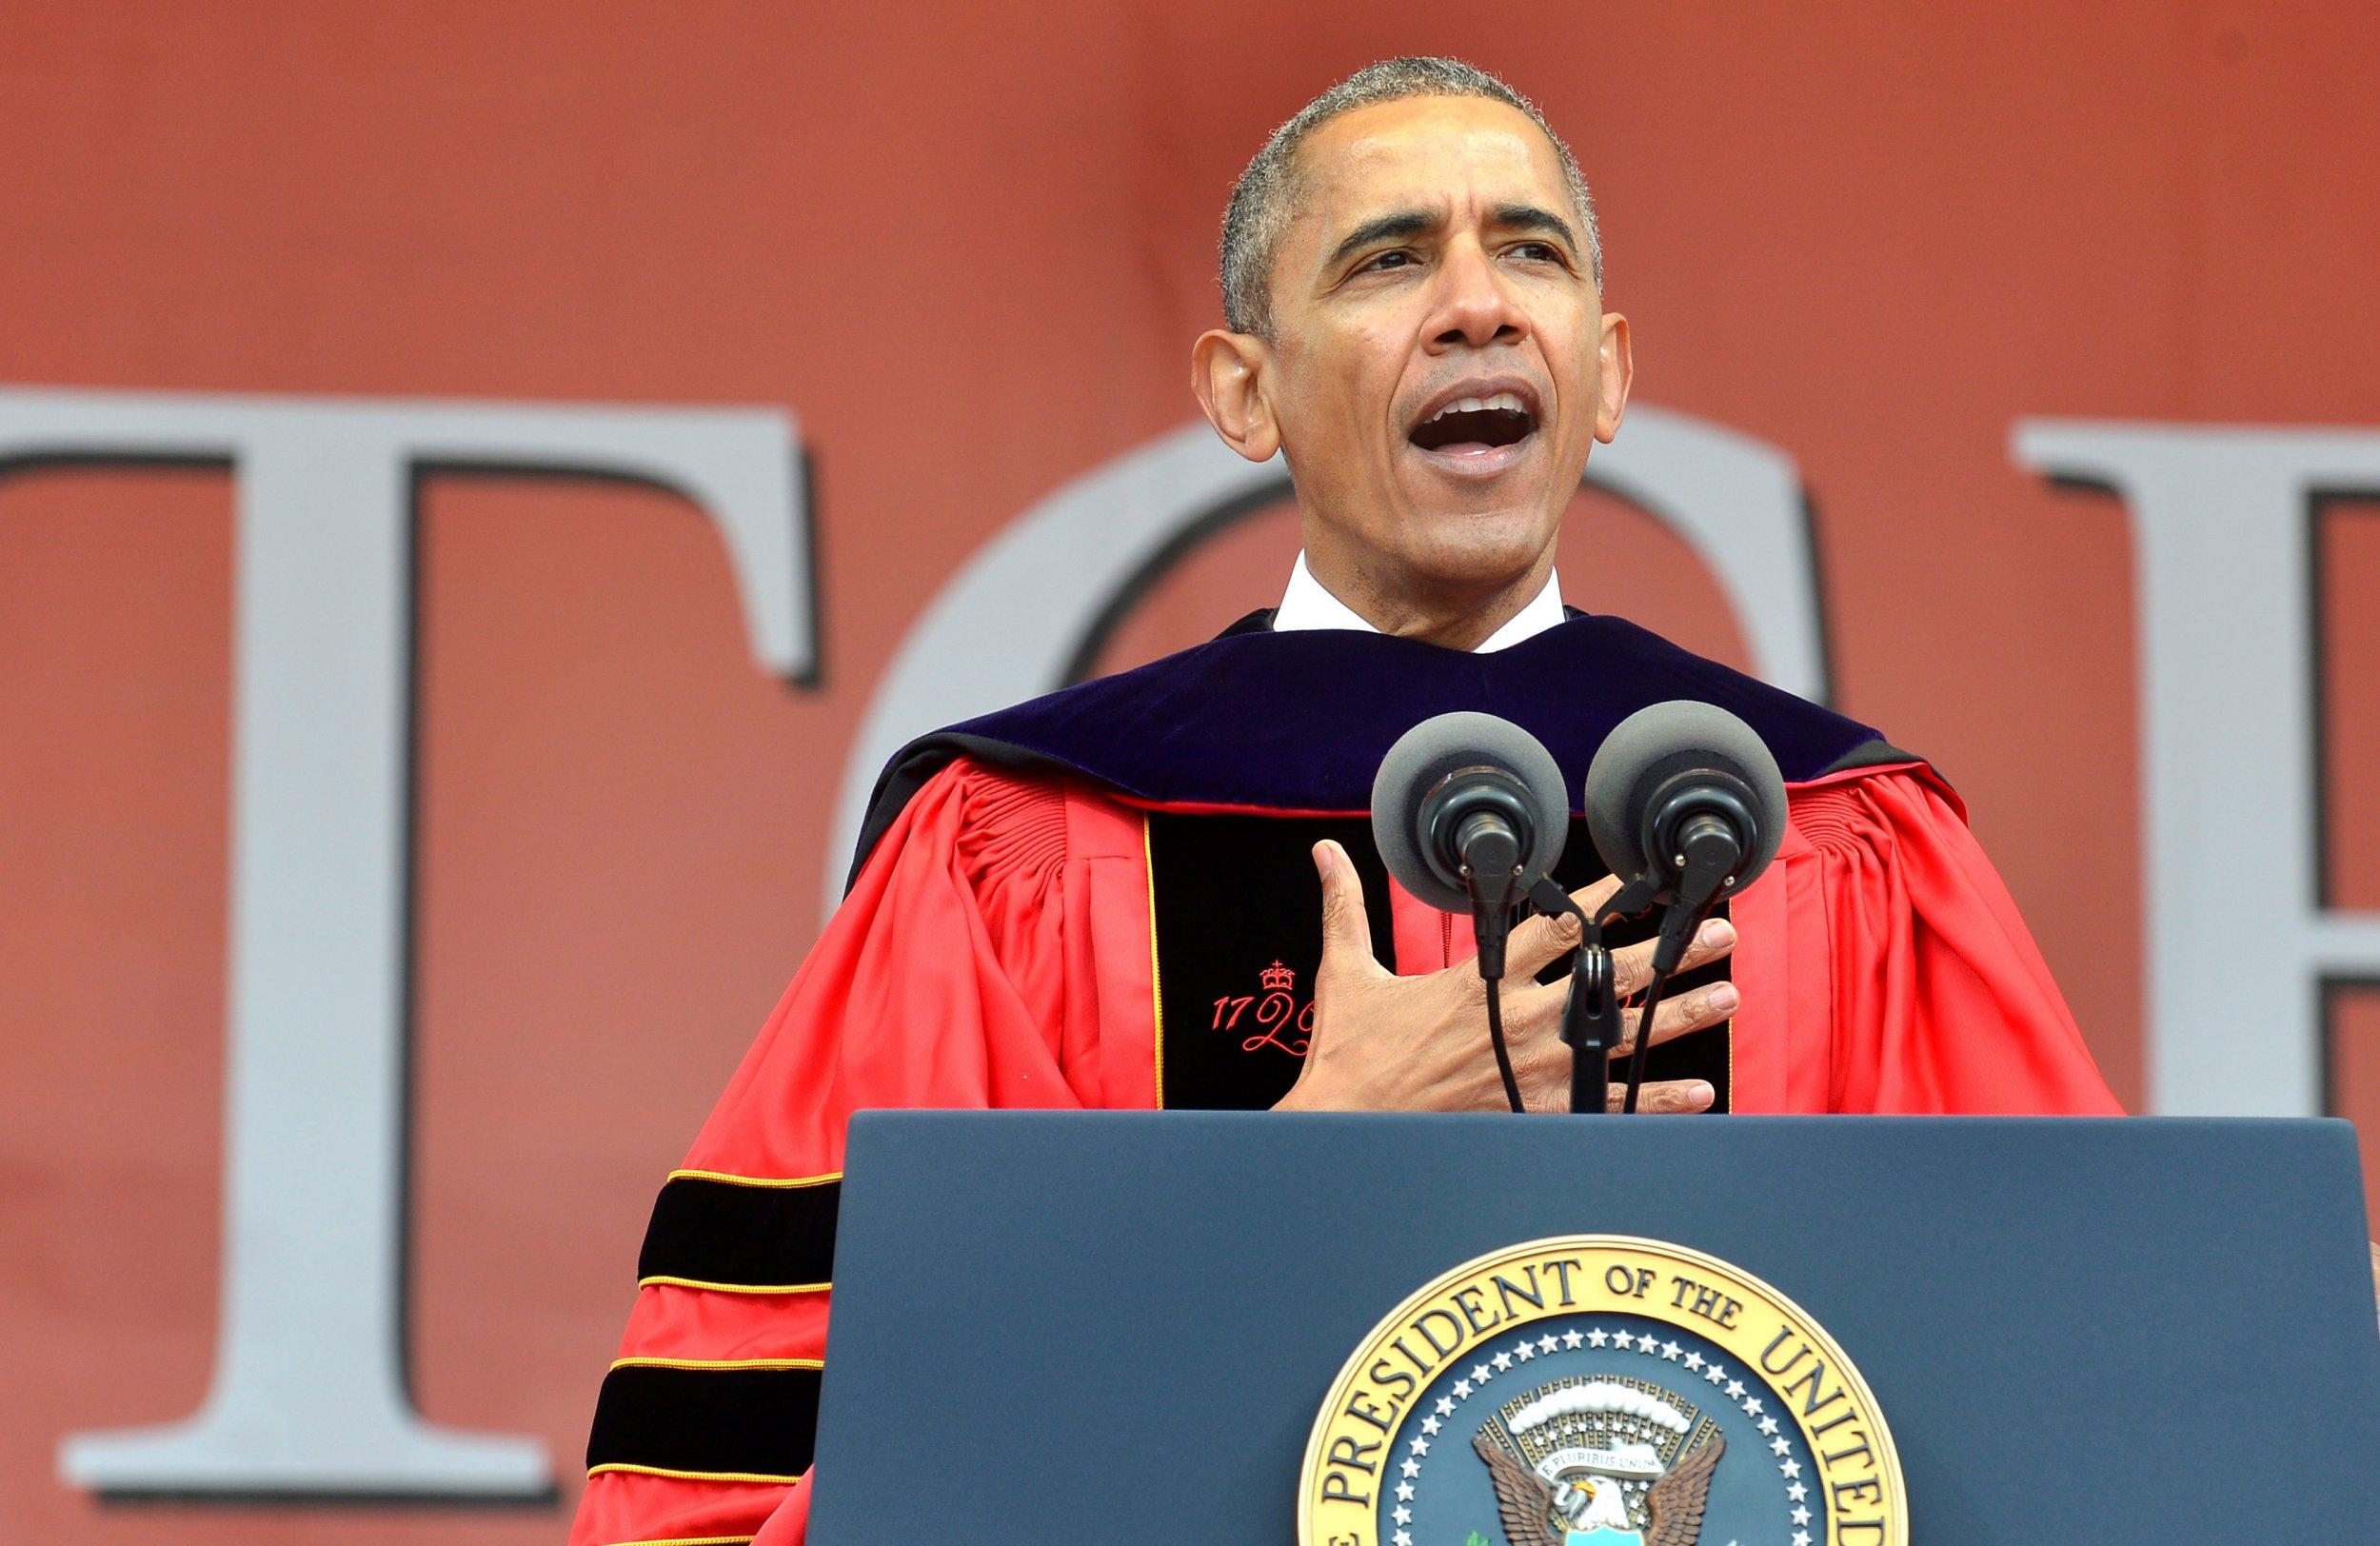 0516_Obama_Rutgers_University_commencement_01